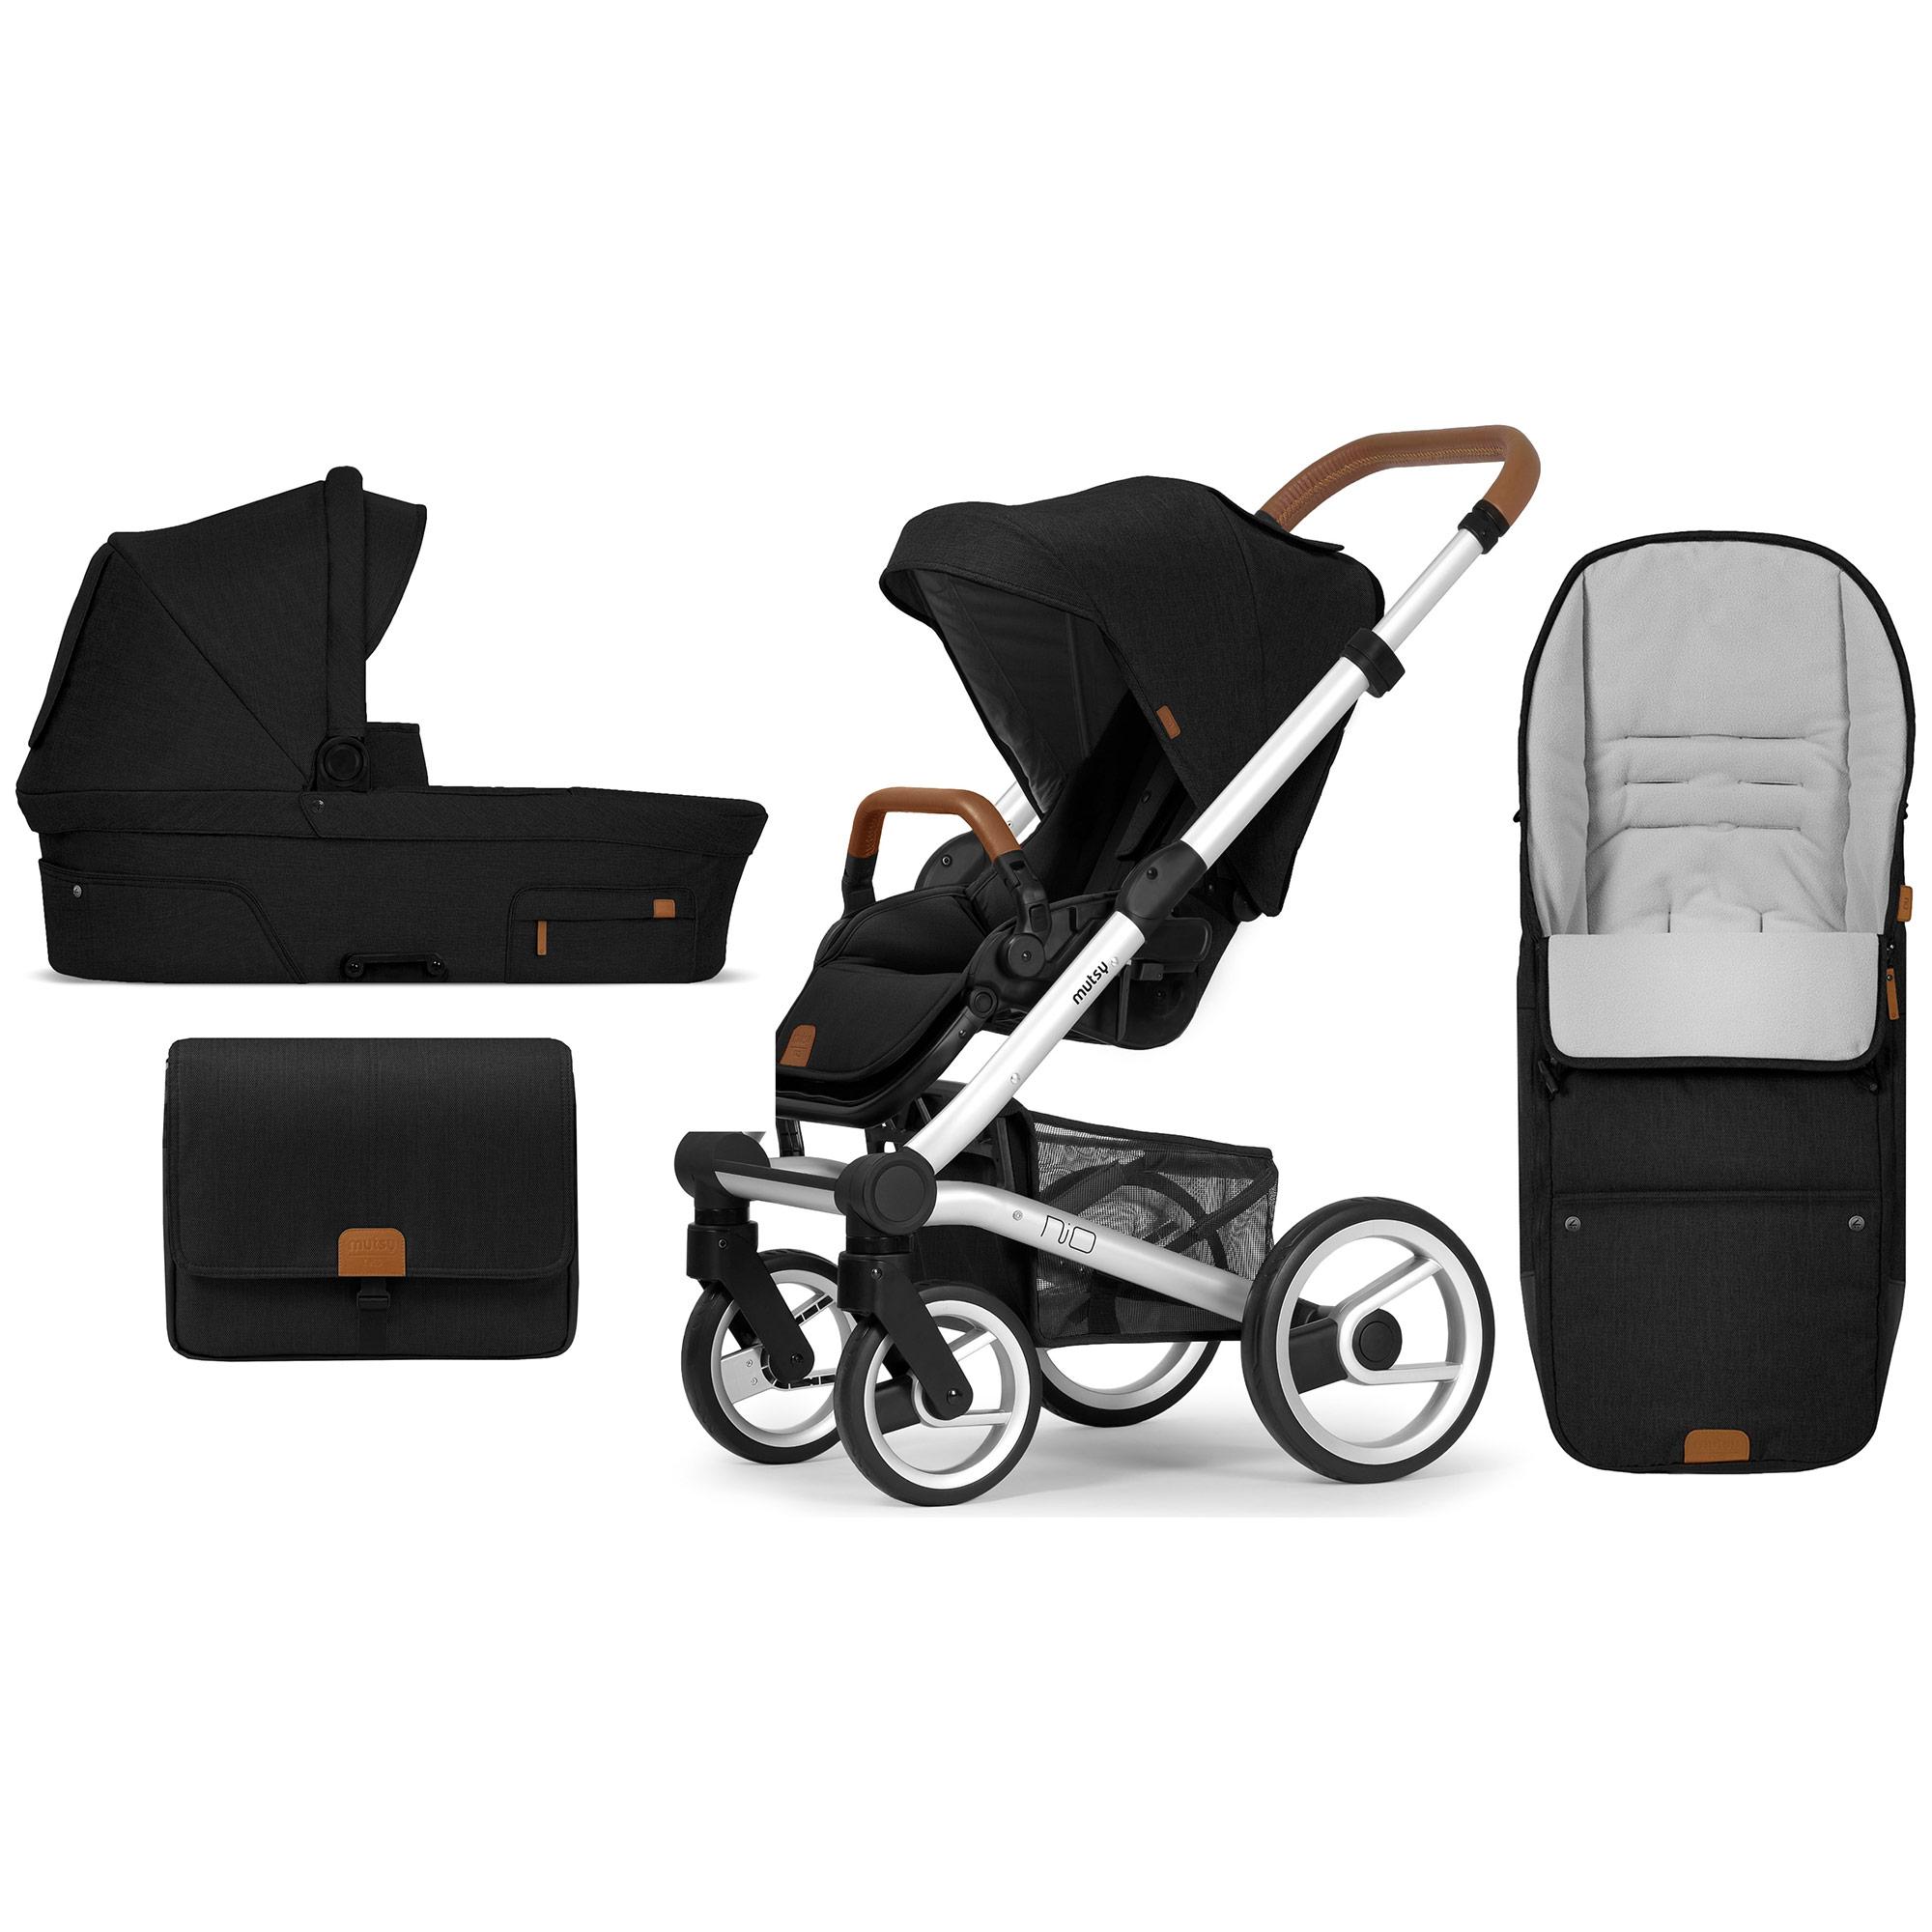 Mutsy Nio Raincover For Nio Pushchair Pram Accessories Baby Infant Protection